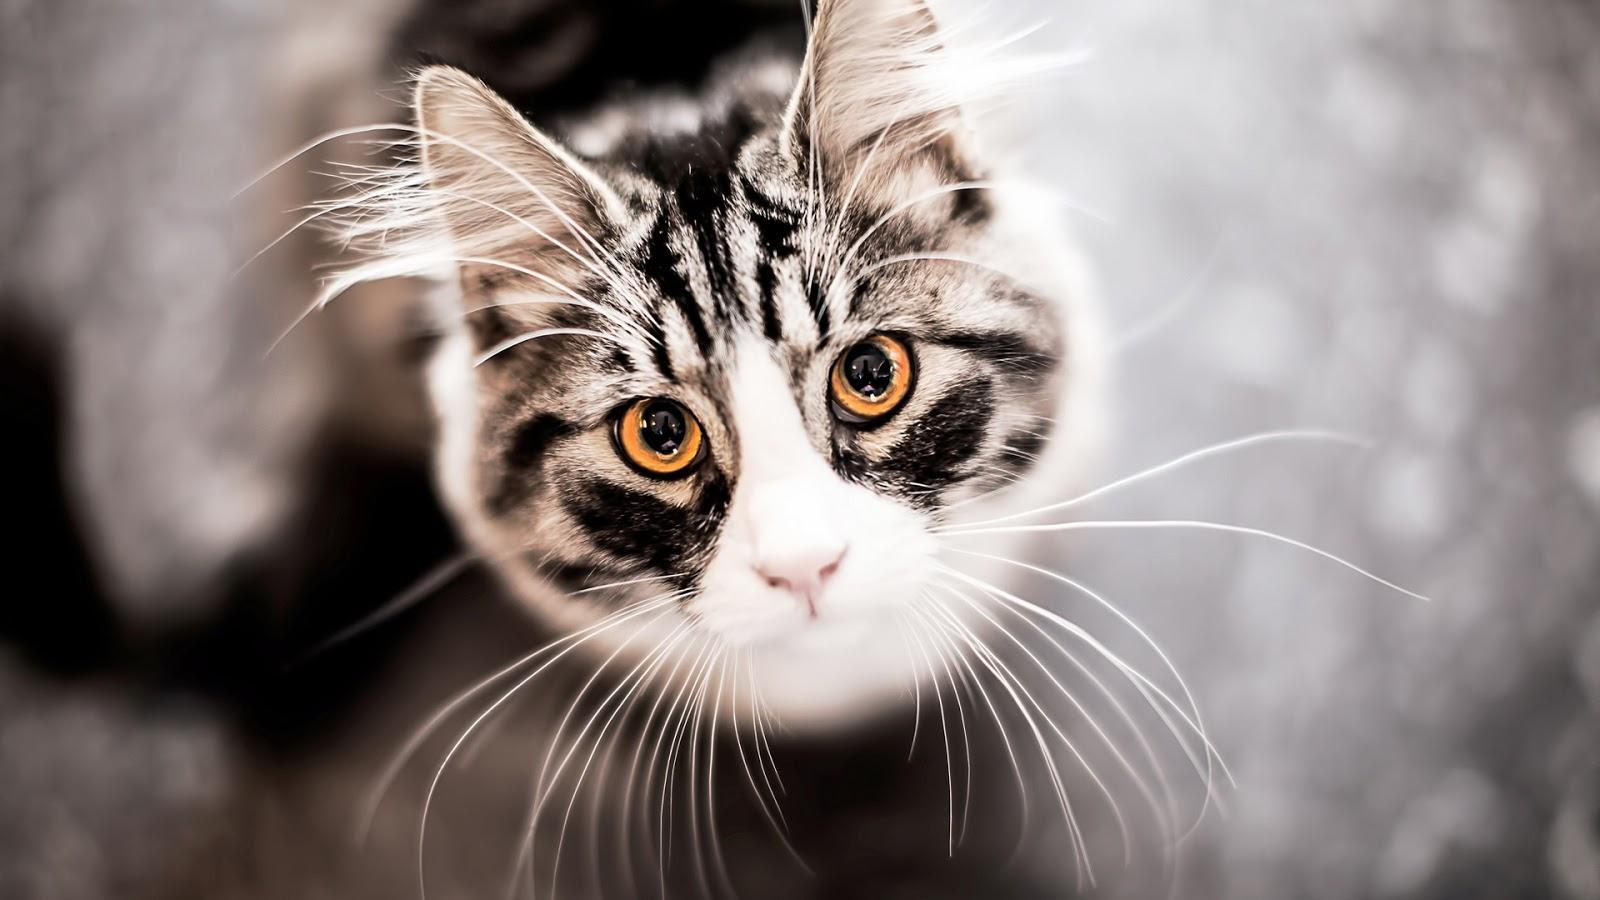 Cats funny face full hd desktop wallpapers 1080p - Caterpillar wallpaper ...